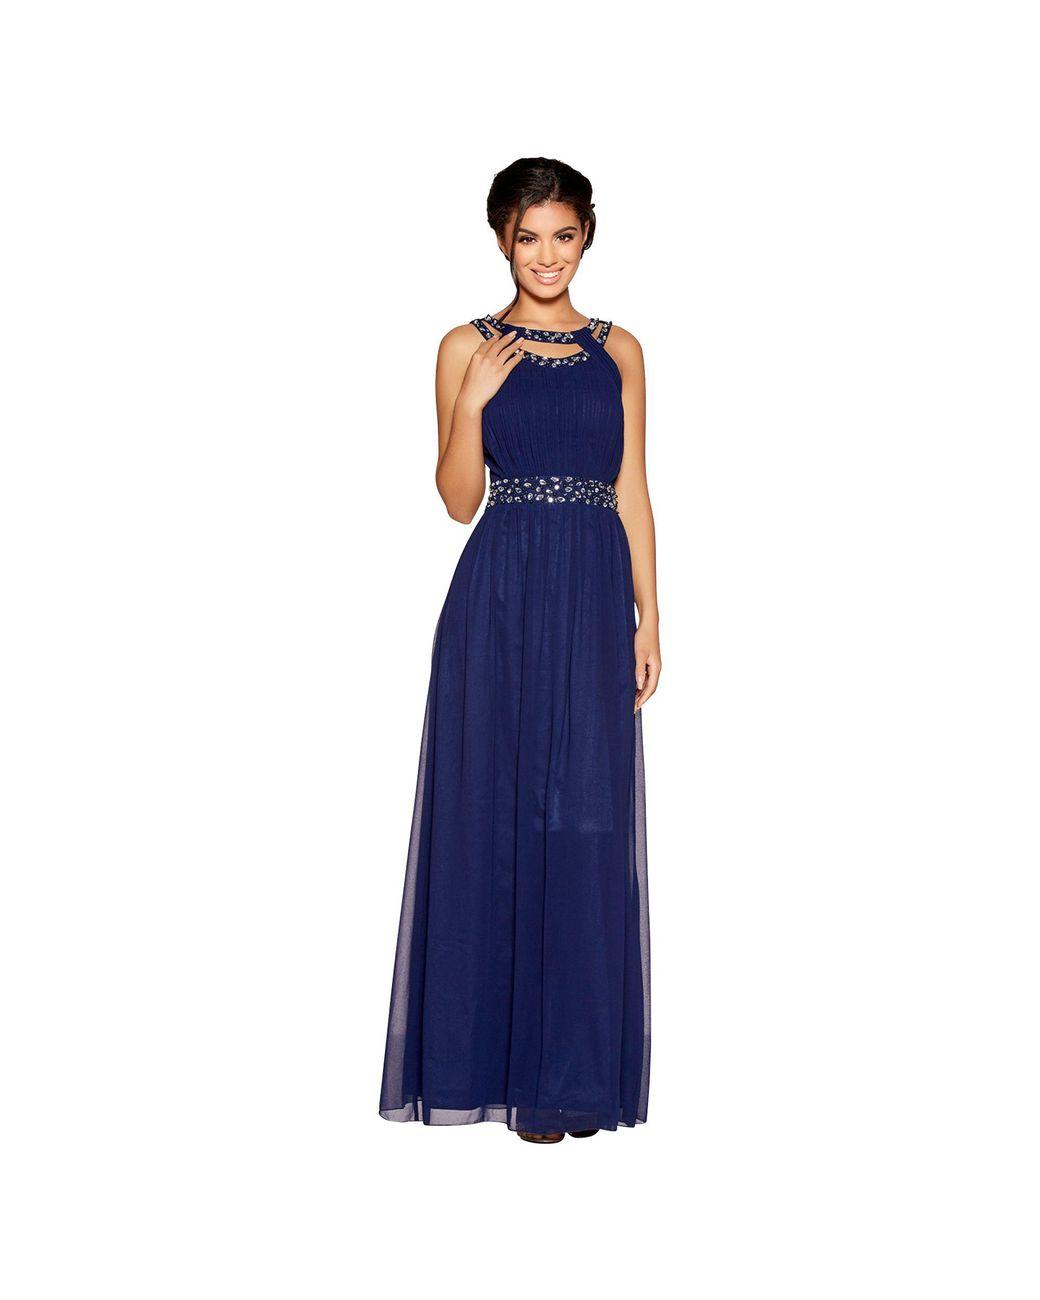 9b521b542871 Quiz Navy Chiffon Round Neck Embellished Maxi Dress in Blue - Lyst